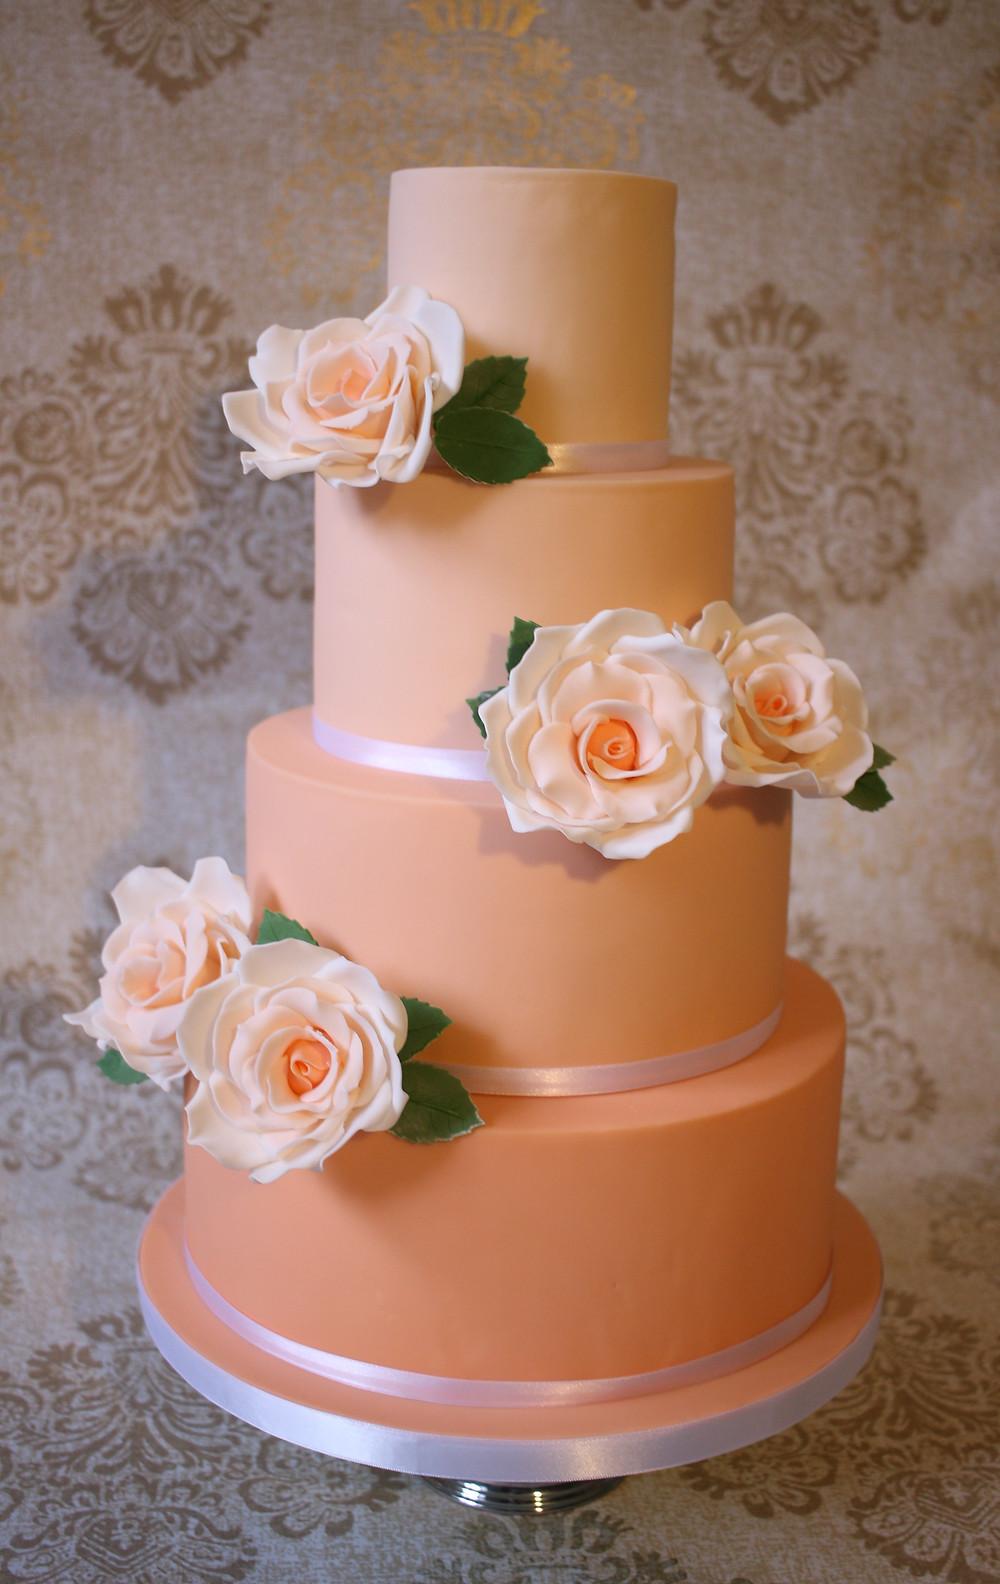 Vegan wedding cake (and fabulous!)